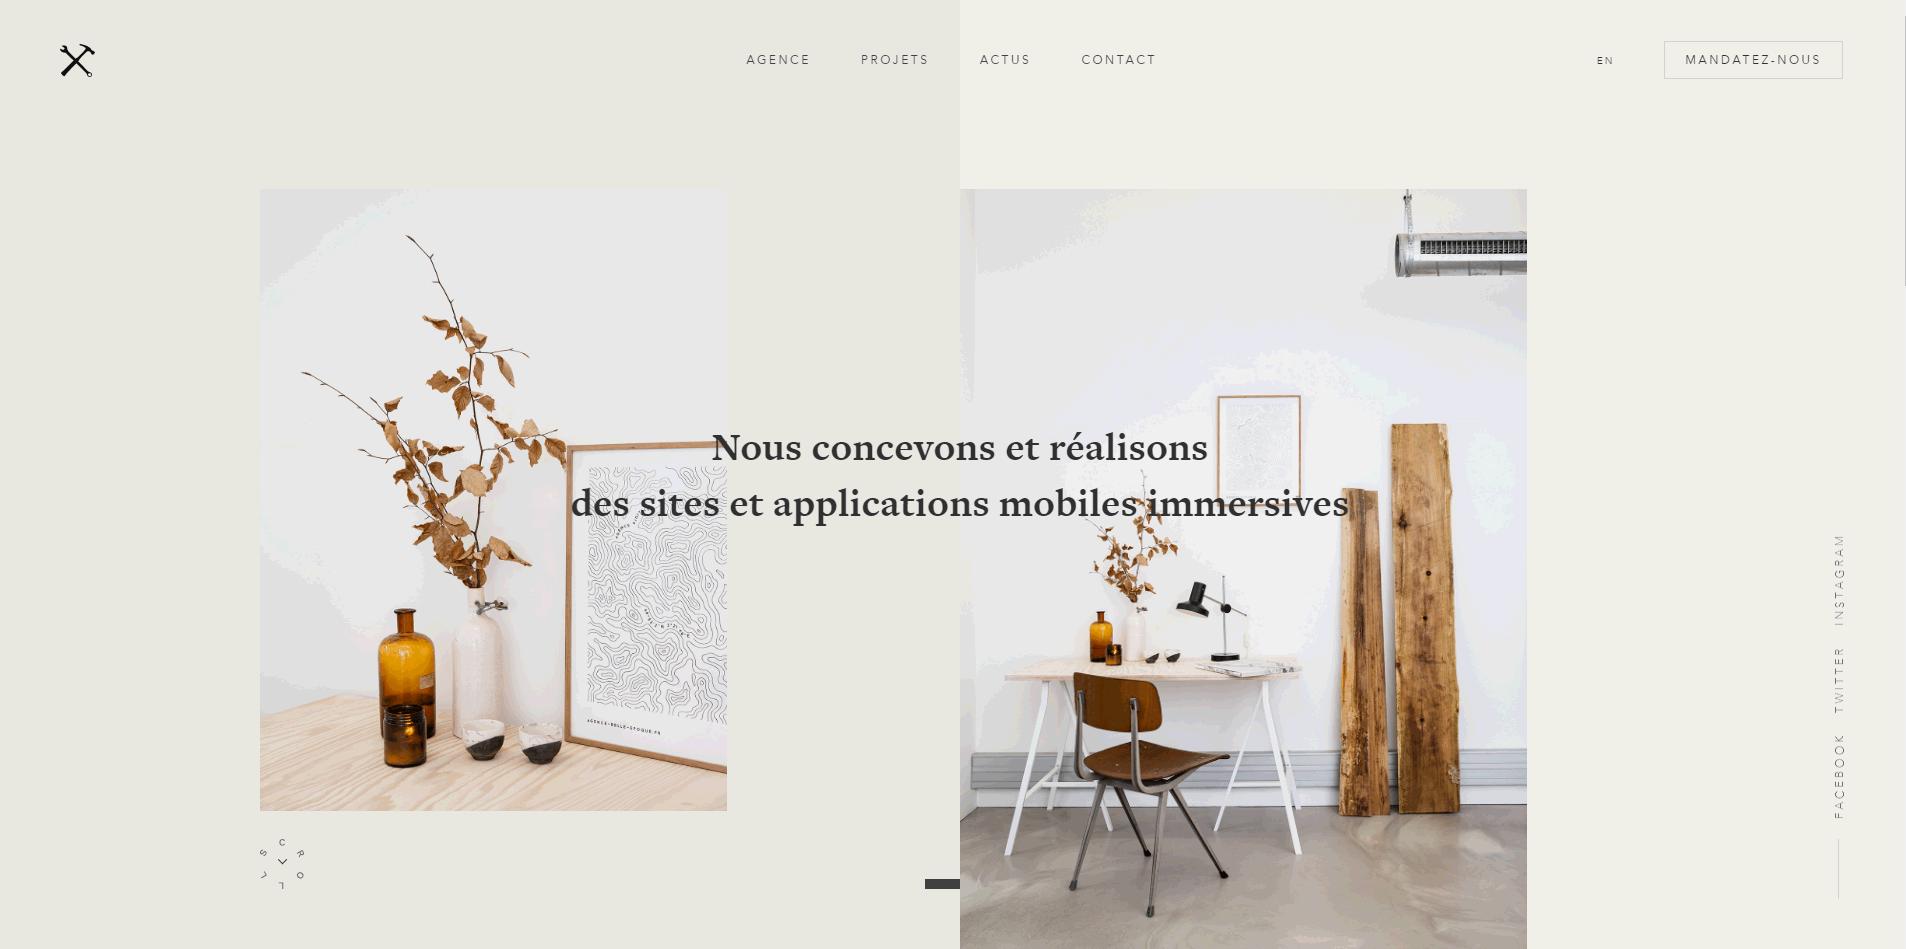 minimalismus2